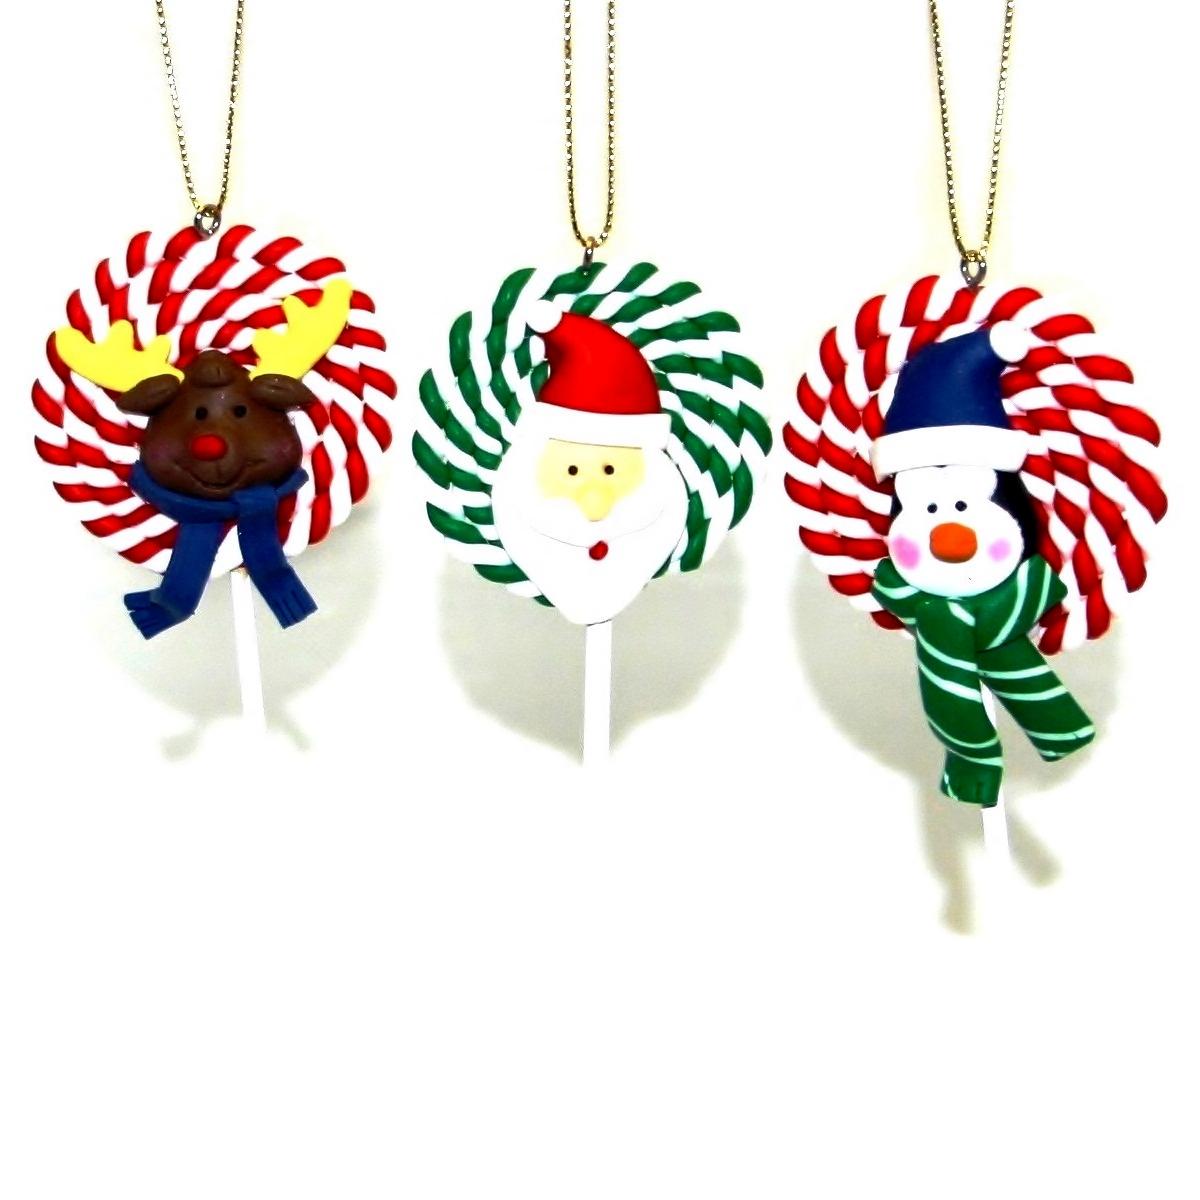 Homemade Christmas Decorations Uk: Clay Christmas Tree Ornaments Handmade